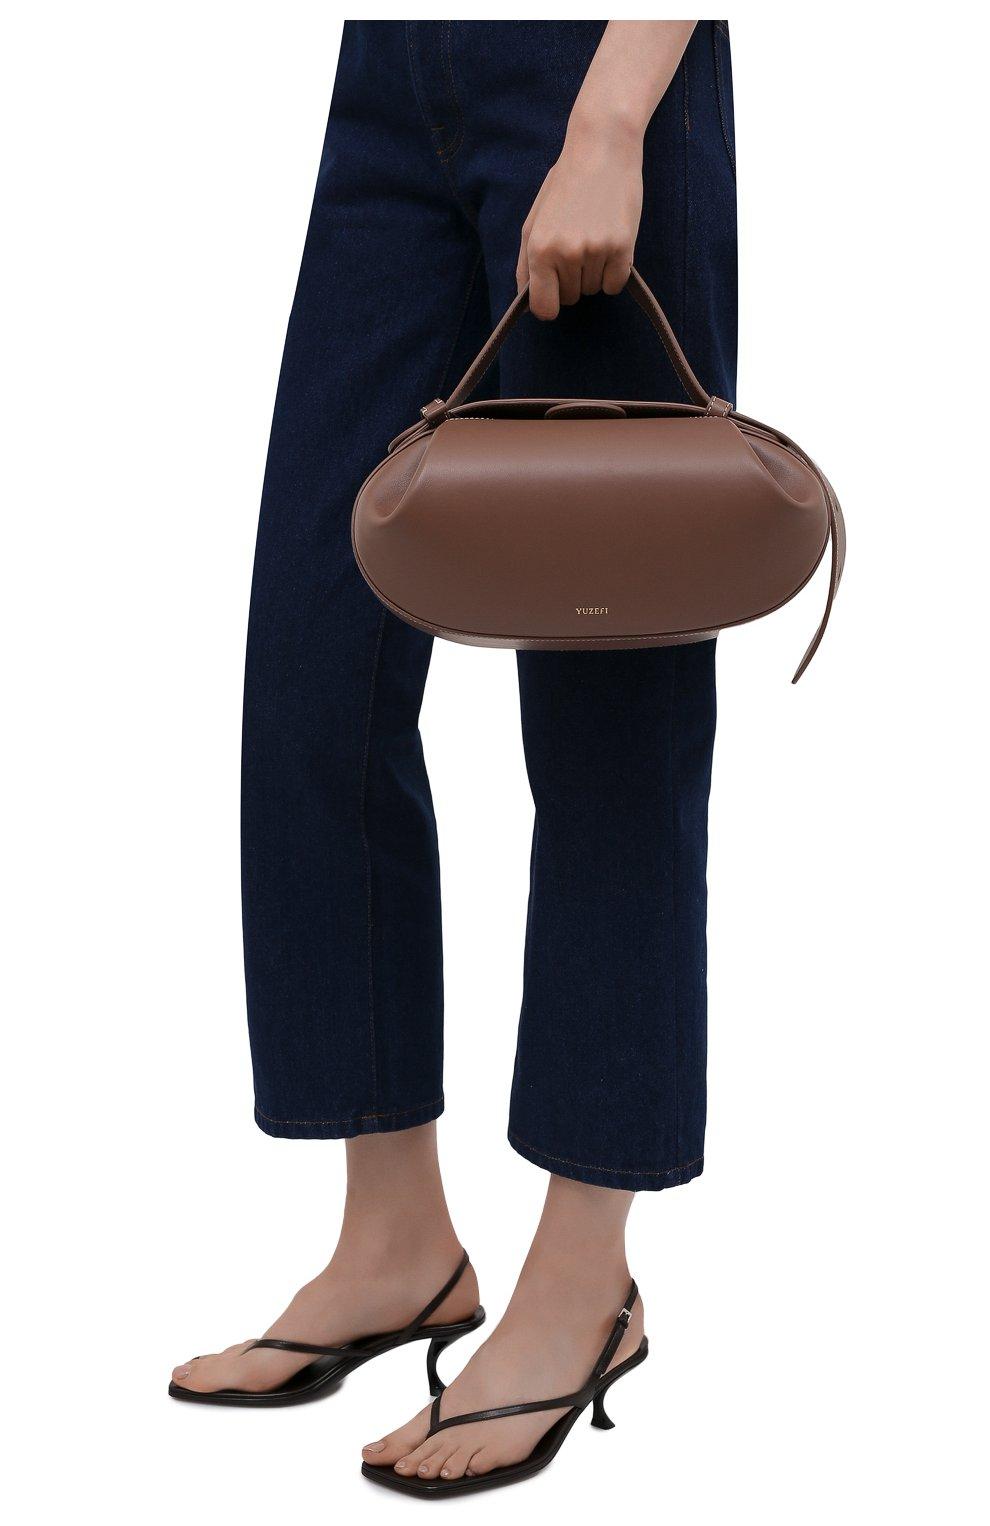 Женская сумка loaf YUZEFI бежевого цвета, арт. YUZPF21-HB-L0-14 | Фото 2 (Сумки-технические: Сумки top-handle; Размер: medium; Материал: Натуральная кожа; Ремень/цепочка: На ремешке)